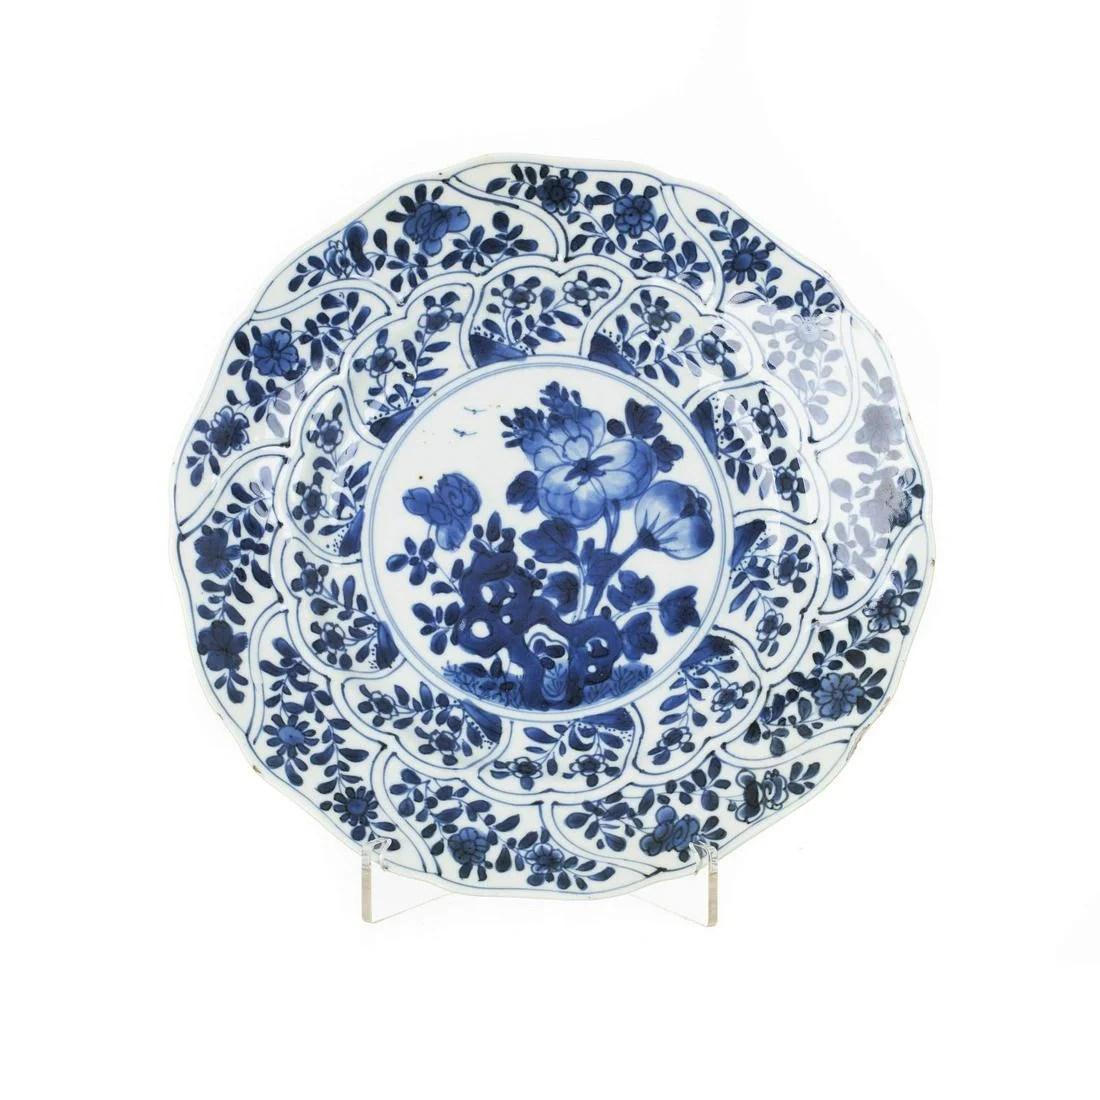 Chinese porcelain plate, Kangxi